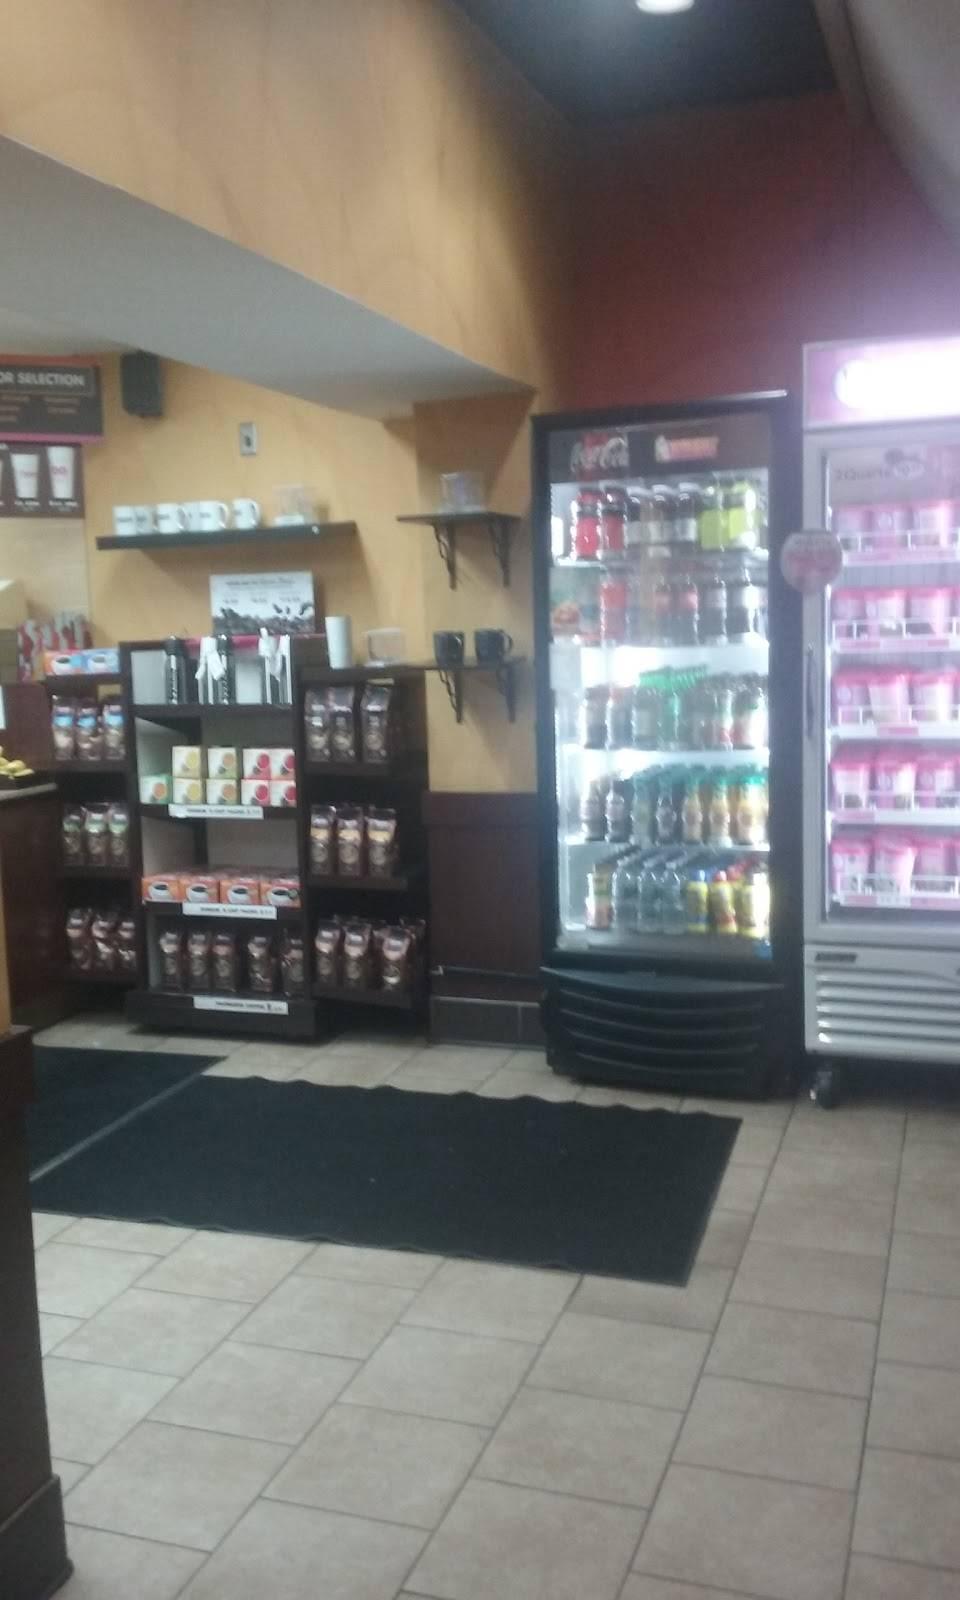 Dunkin Donuts | cafe | 7101 Boulevard E, Guttenberg, NJ 07093, USA | 2018687415 OR +1 201-868-7415